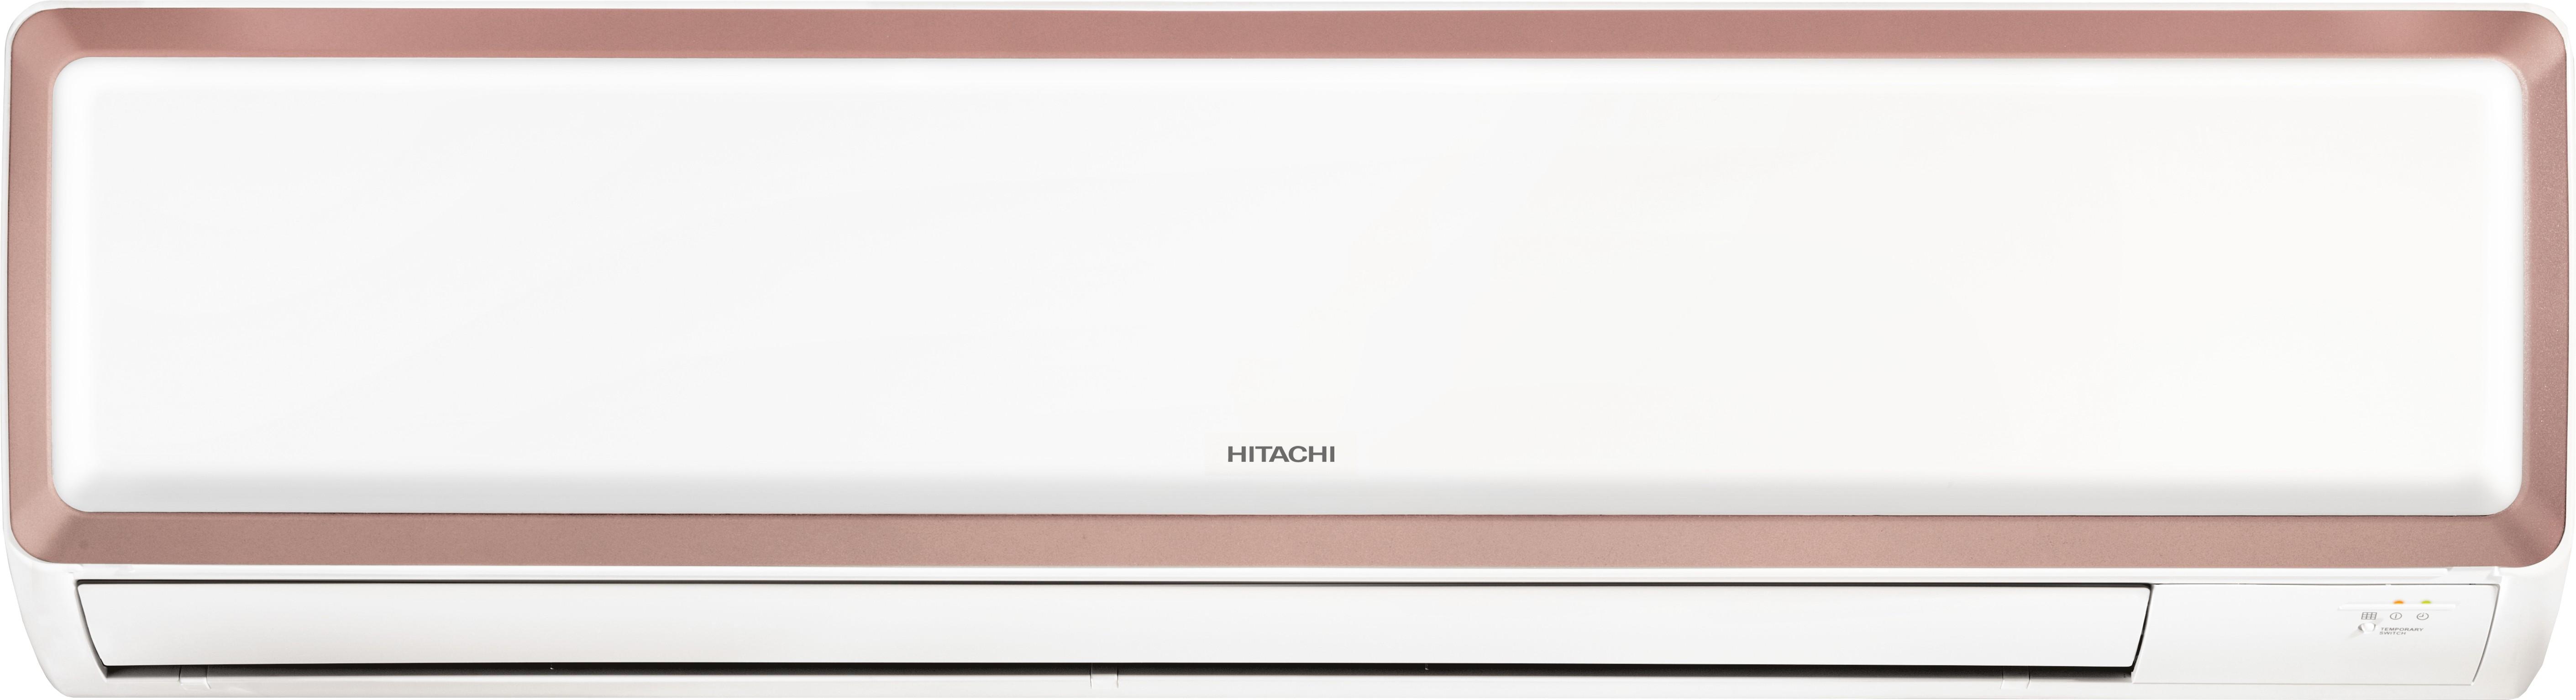 Hitachi 1.2 Tons 5 Star Split AC Copper (Hitachi)  Buy Online